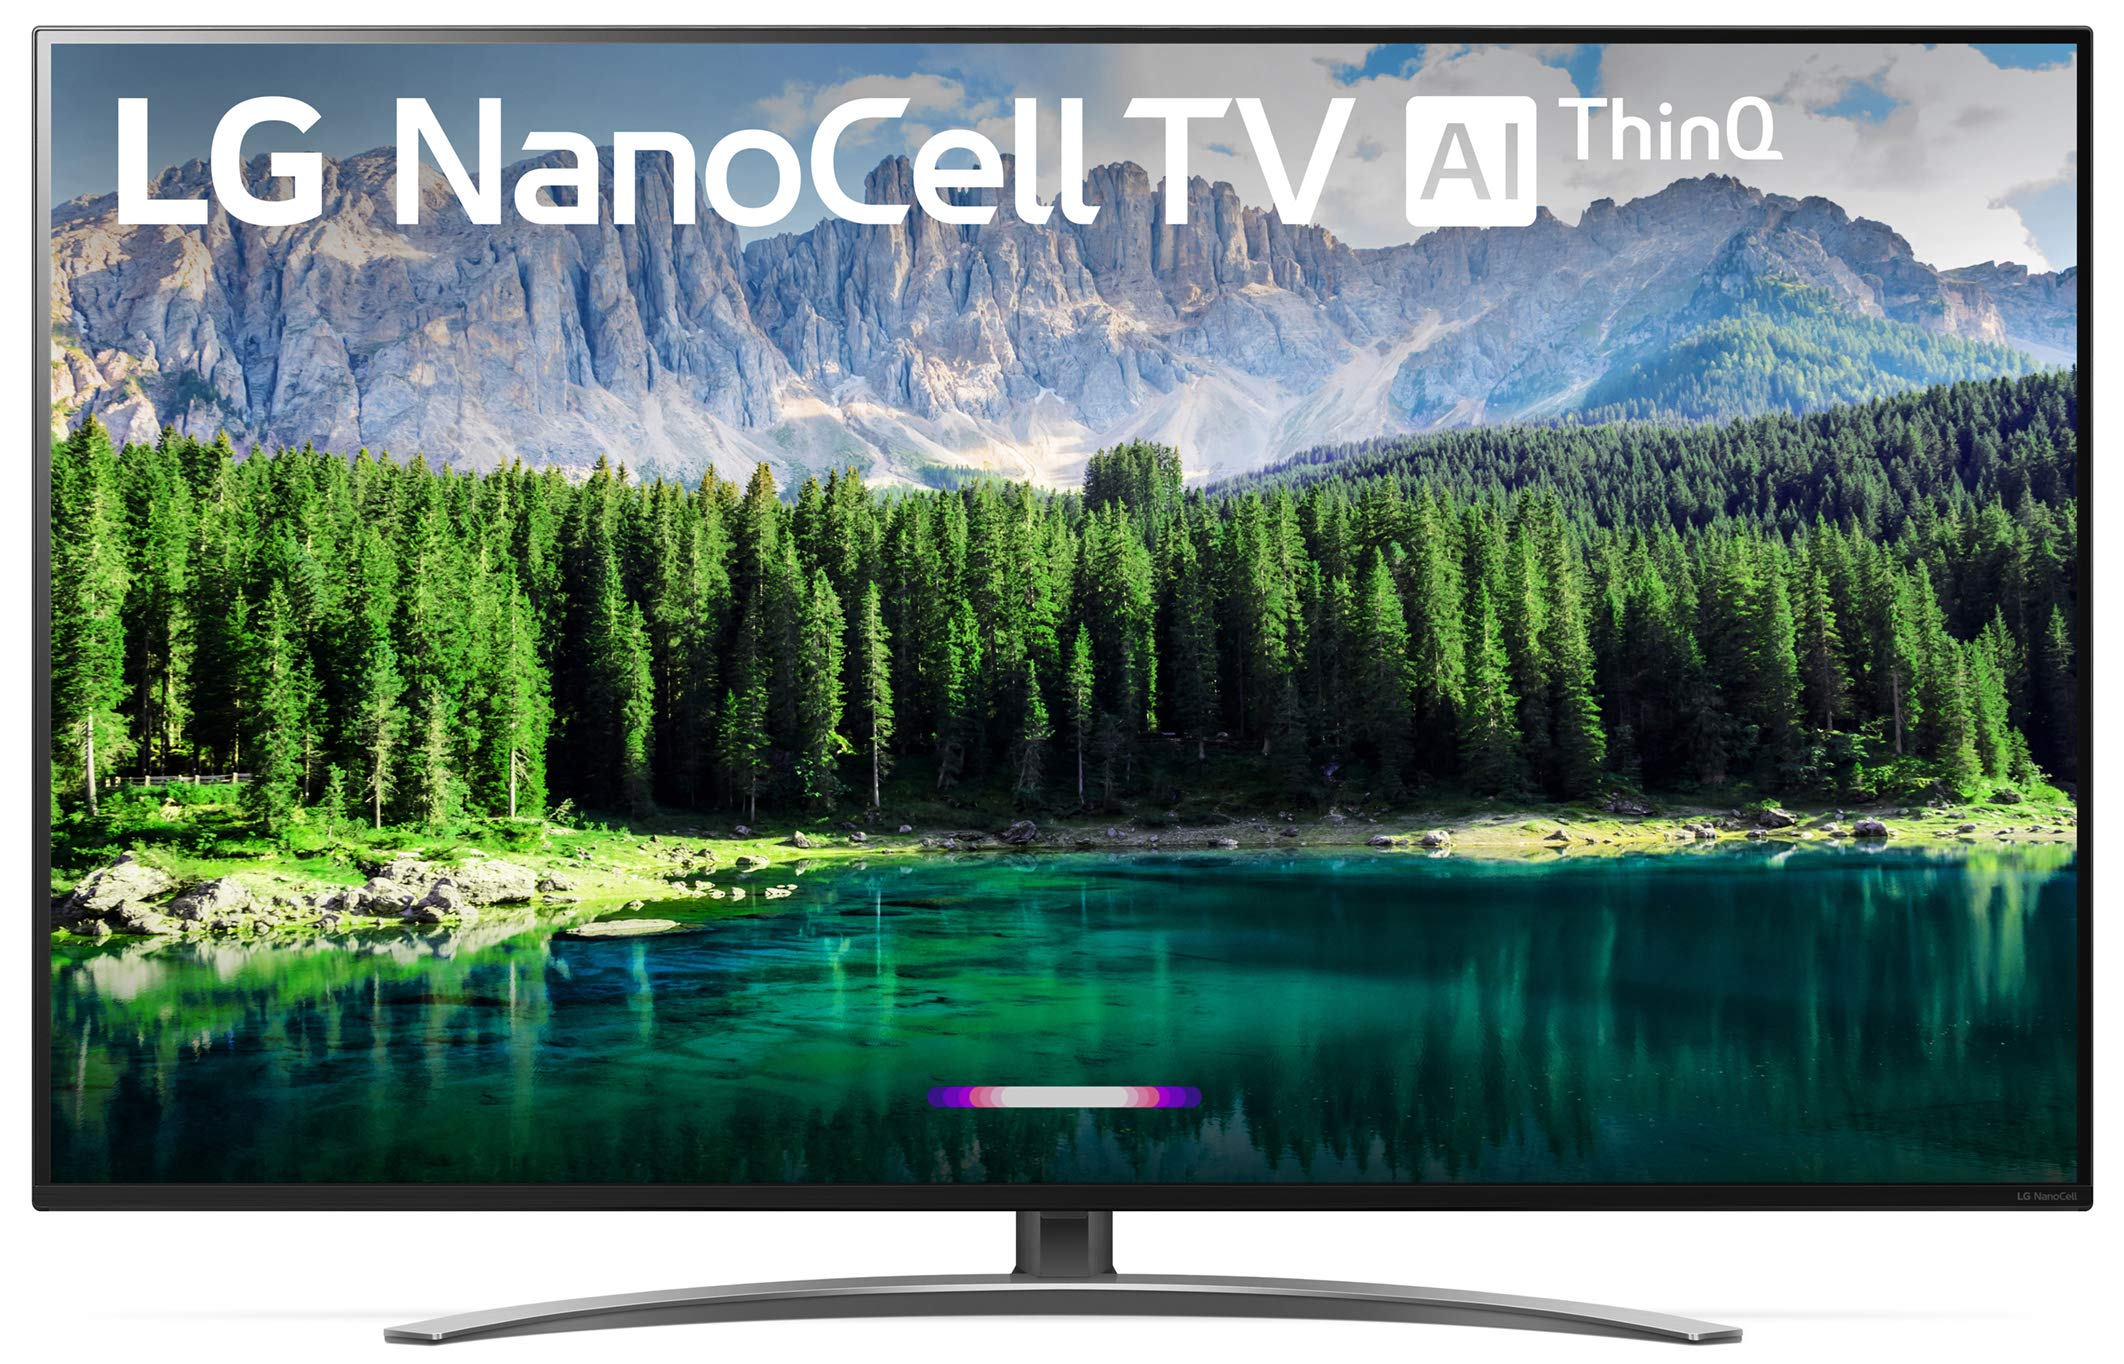 LG 49SM8600PUA Nano 8 Series 49'' 4K Ultra HD Smart LED NanoCell TV (2019) by LG